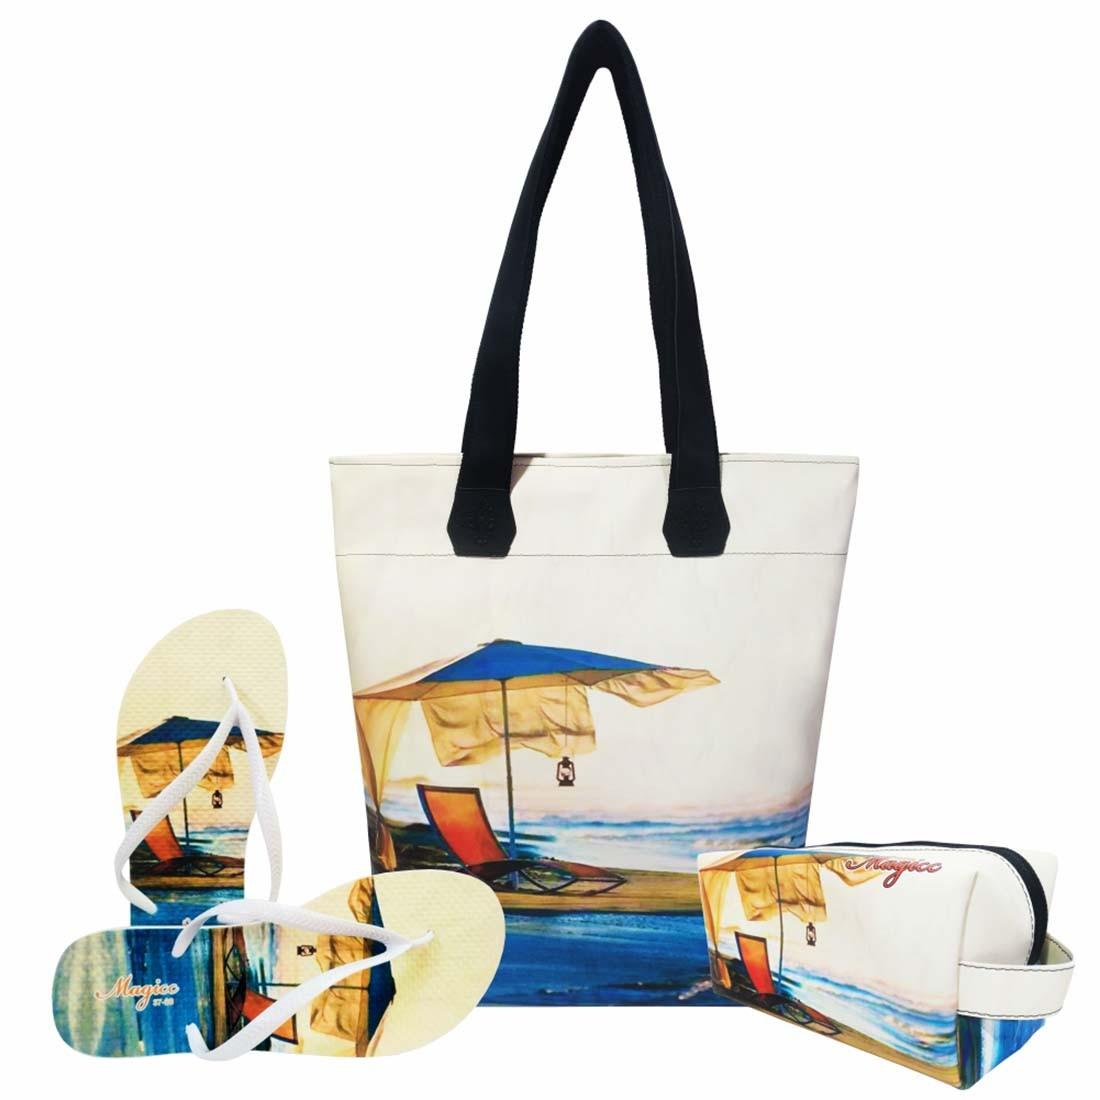 Kit Praia Feminino Sossego com Bolsa, Necessaire e Chinelo, Magicc